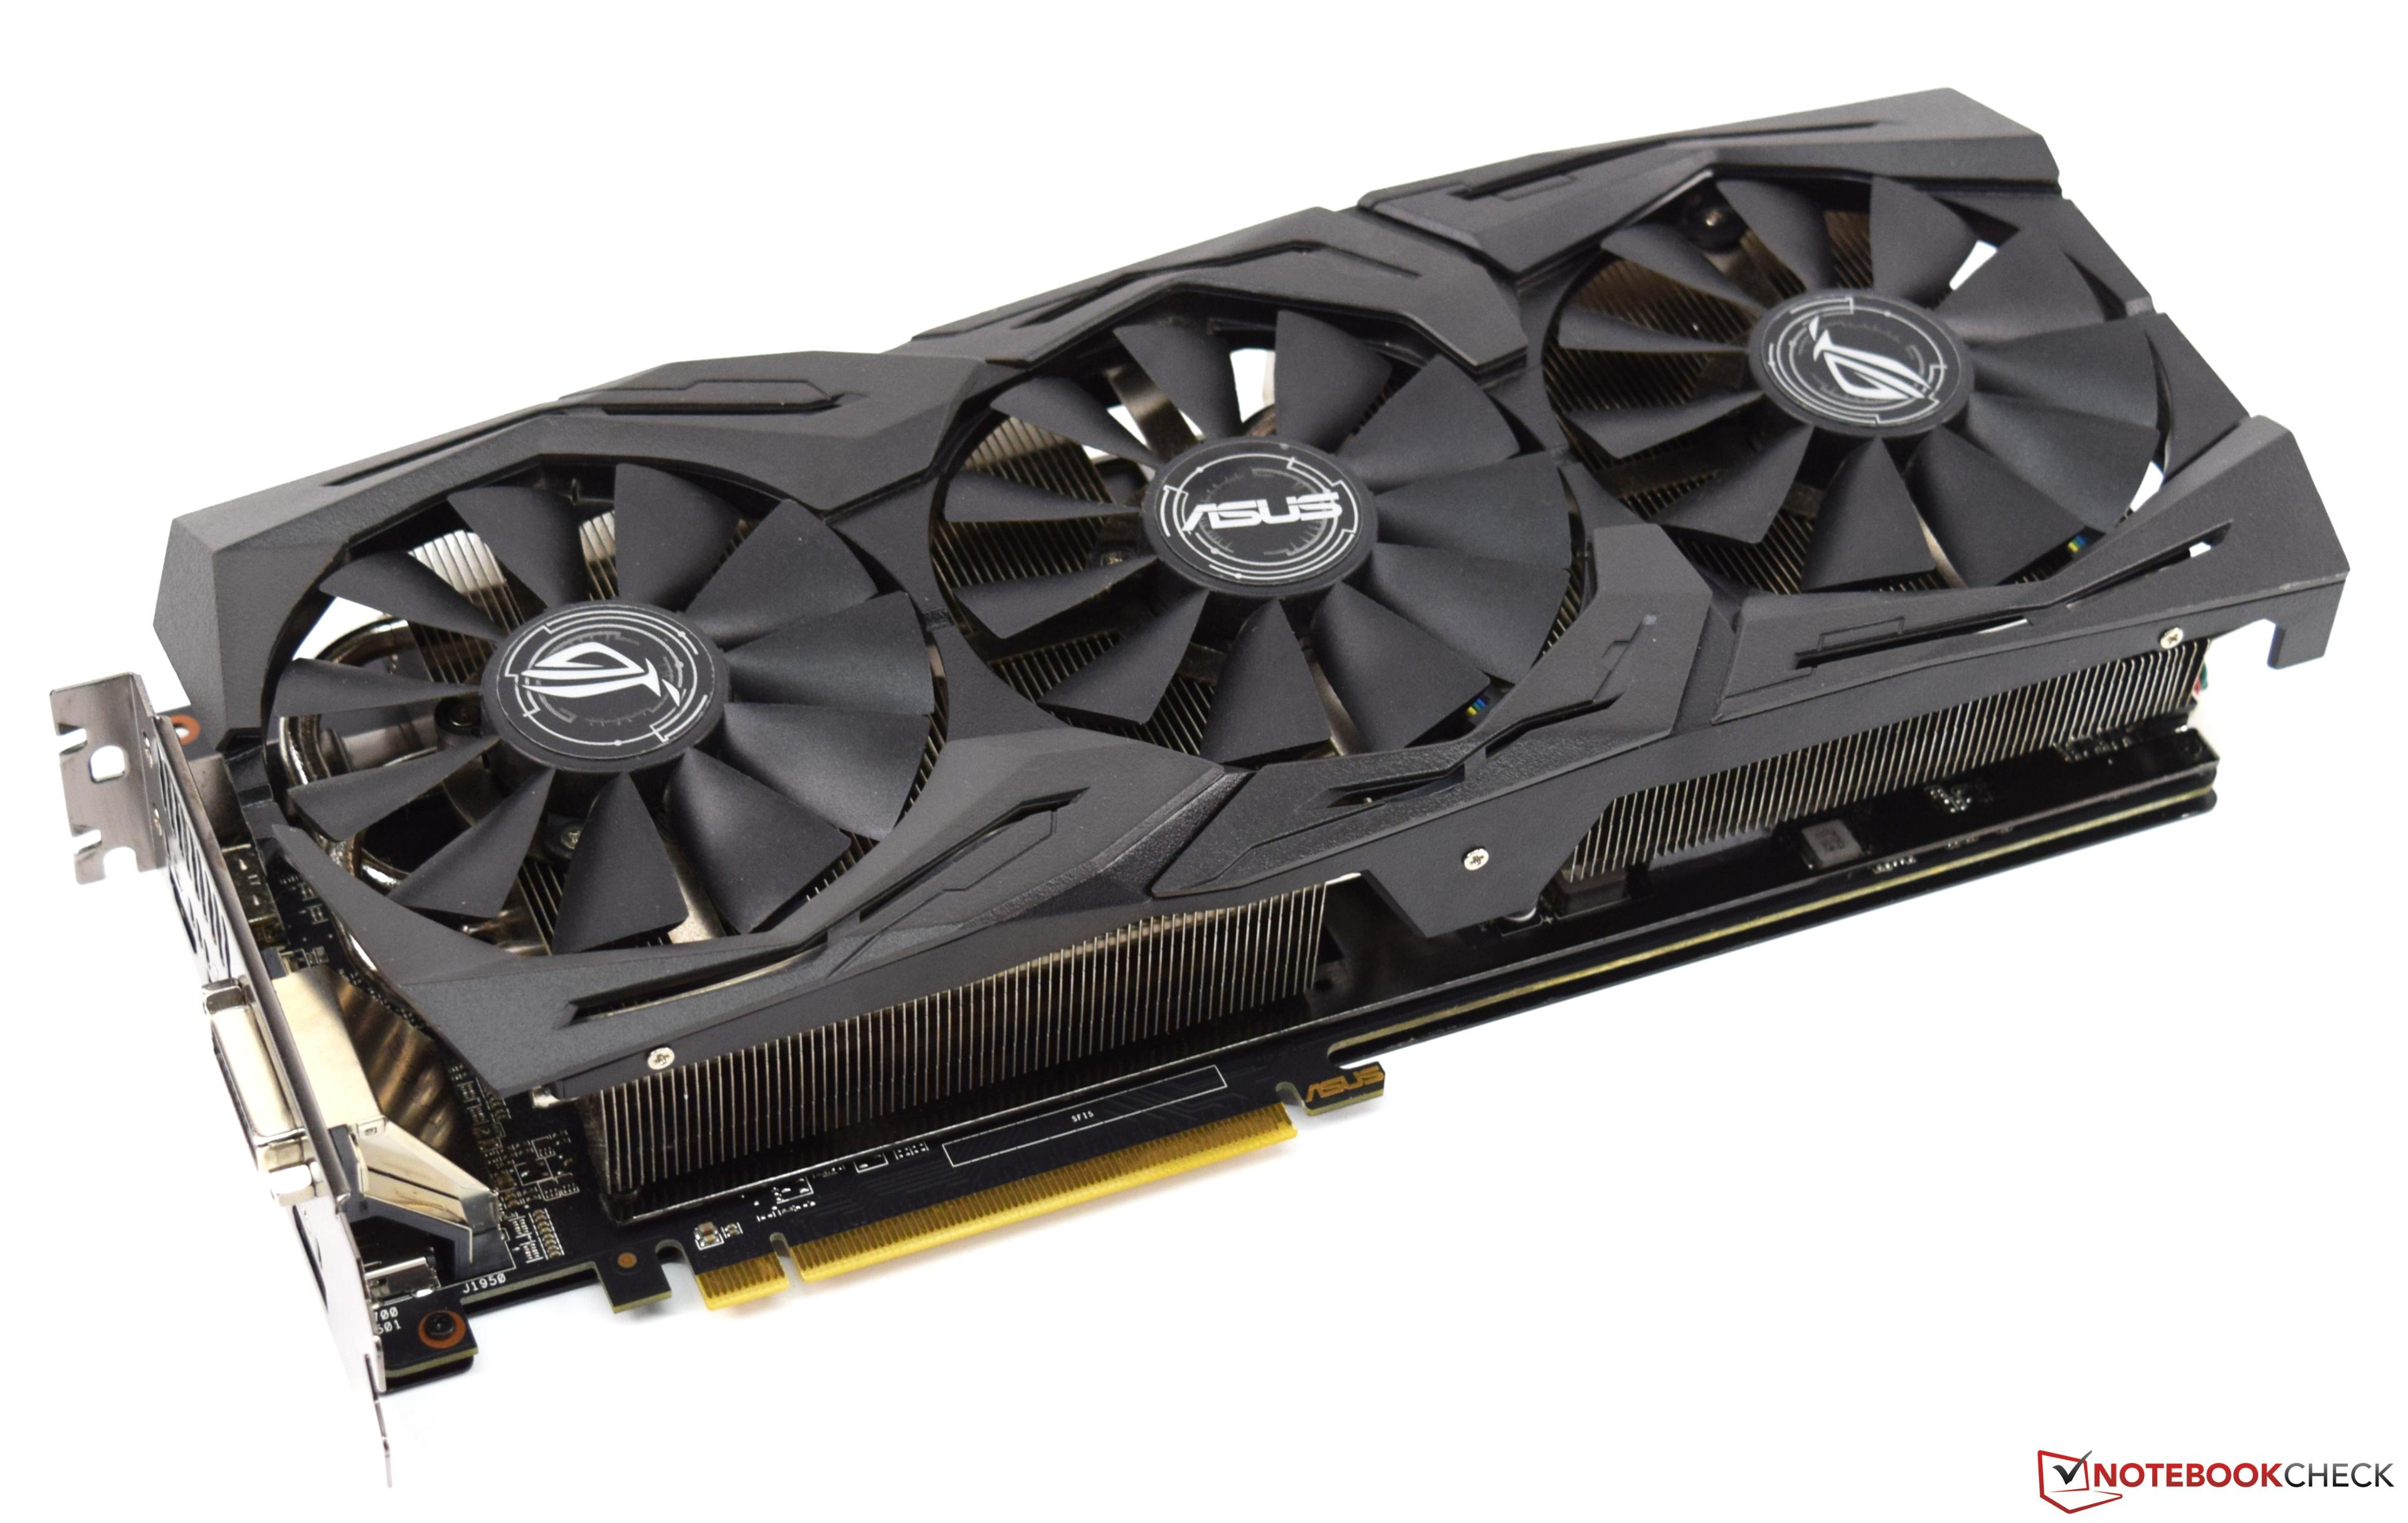 Asus ROG Strix Radeon RX 580 Desktop Graphics Card Review